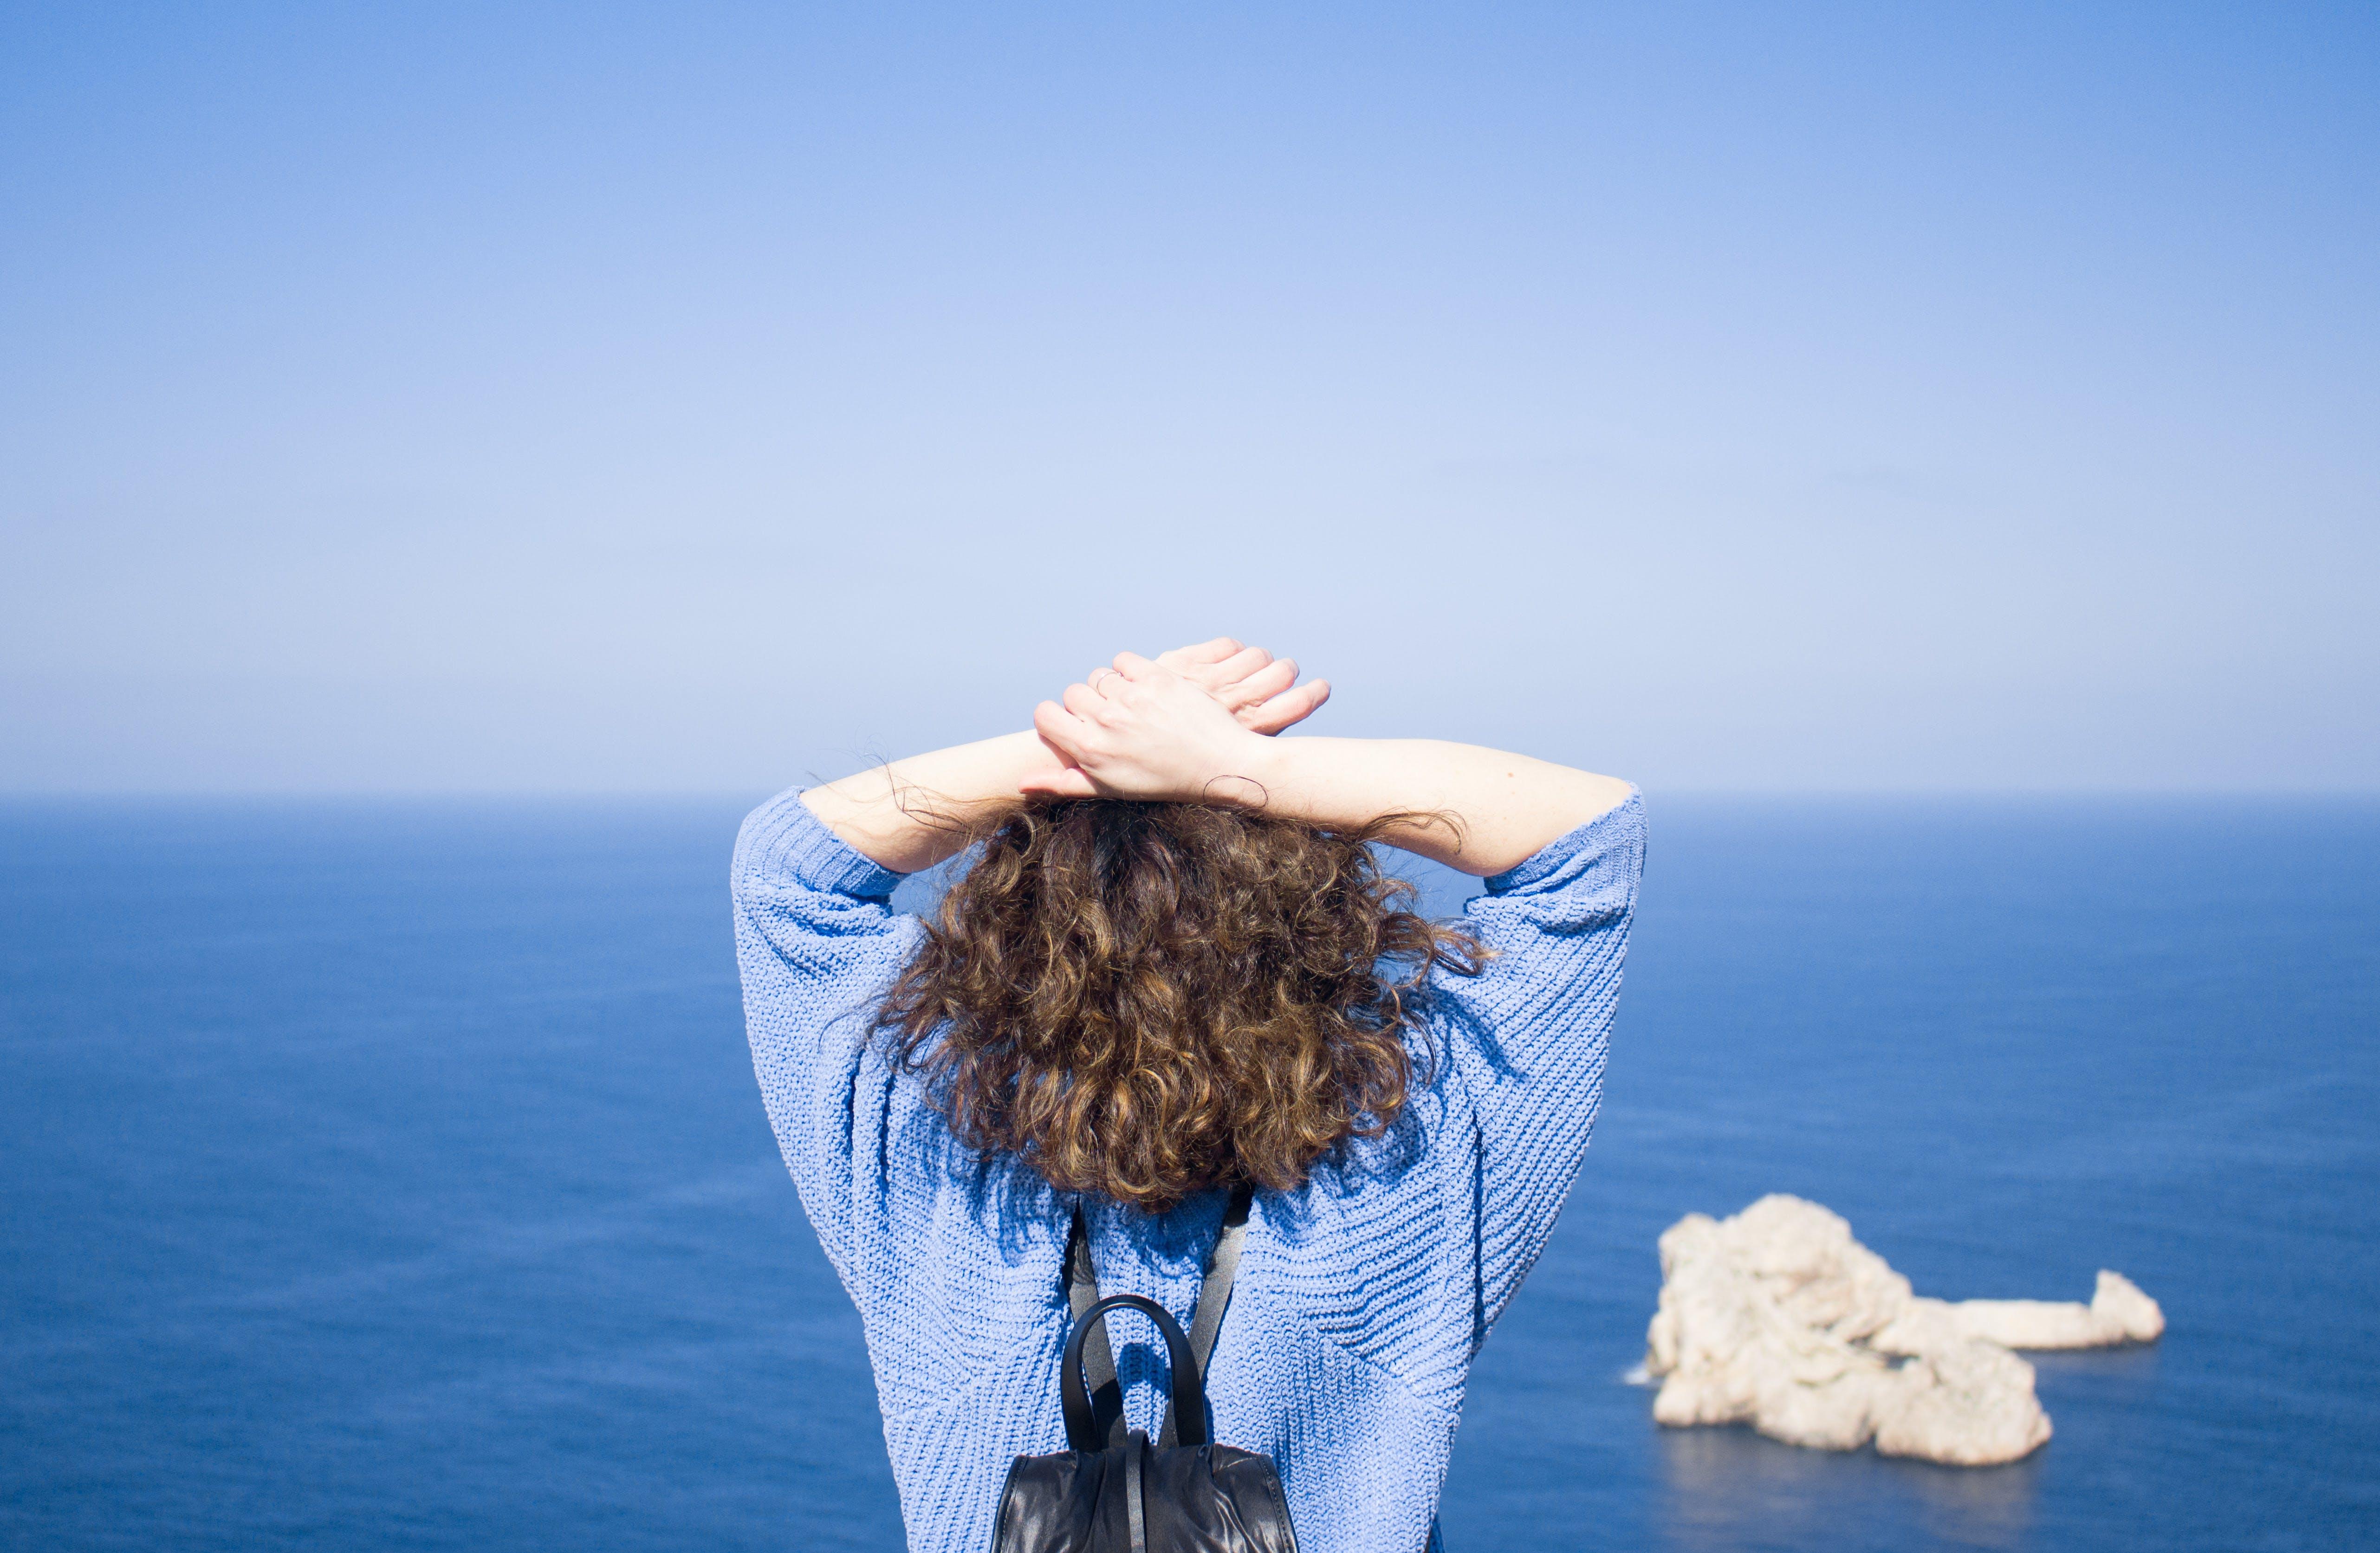 Kostenloses Stock Foto zu blau, blauer himmel, frau, himmel